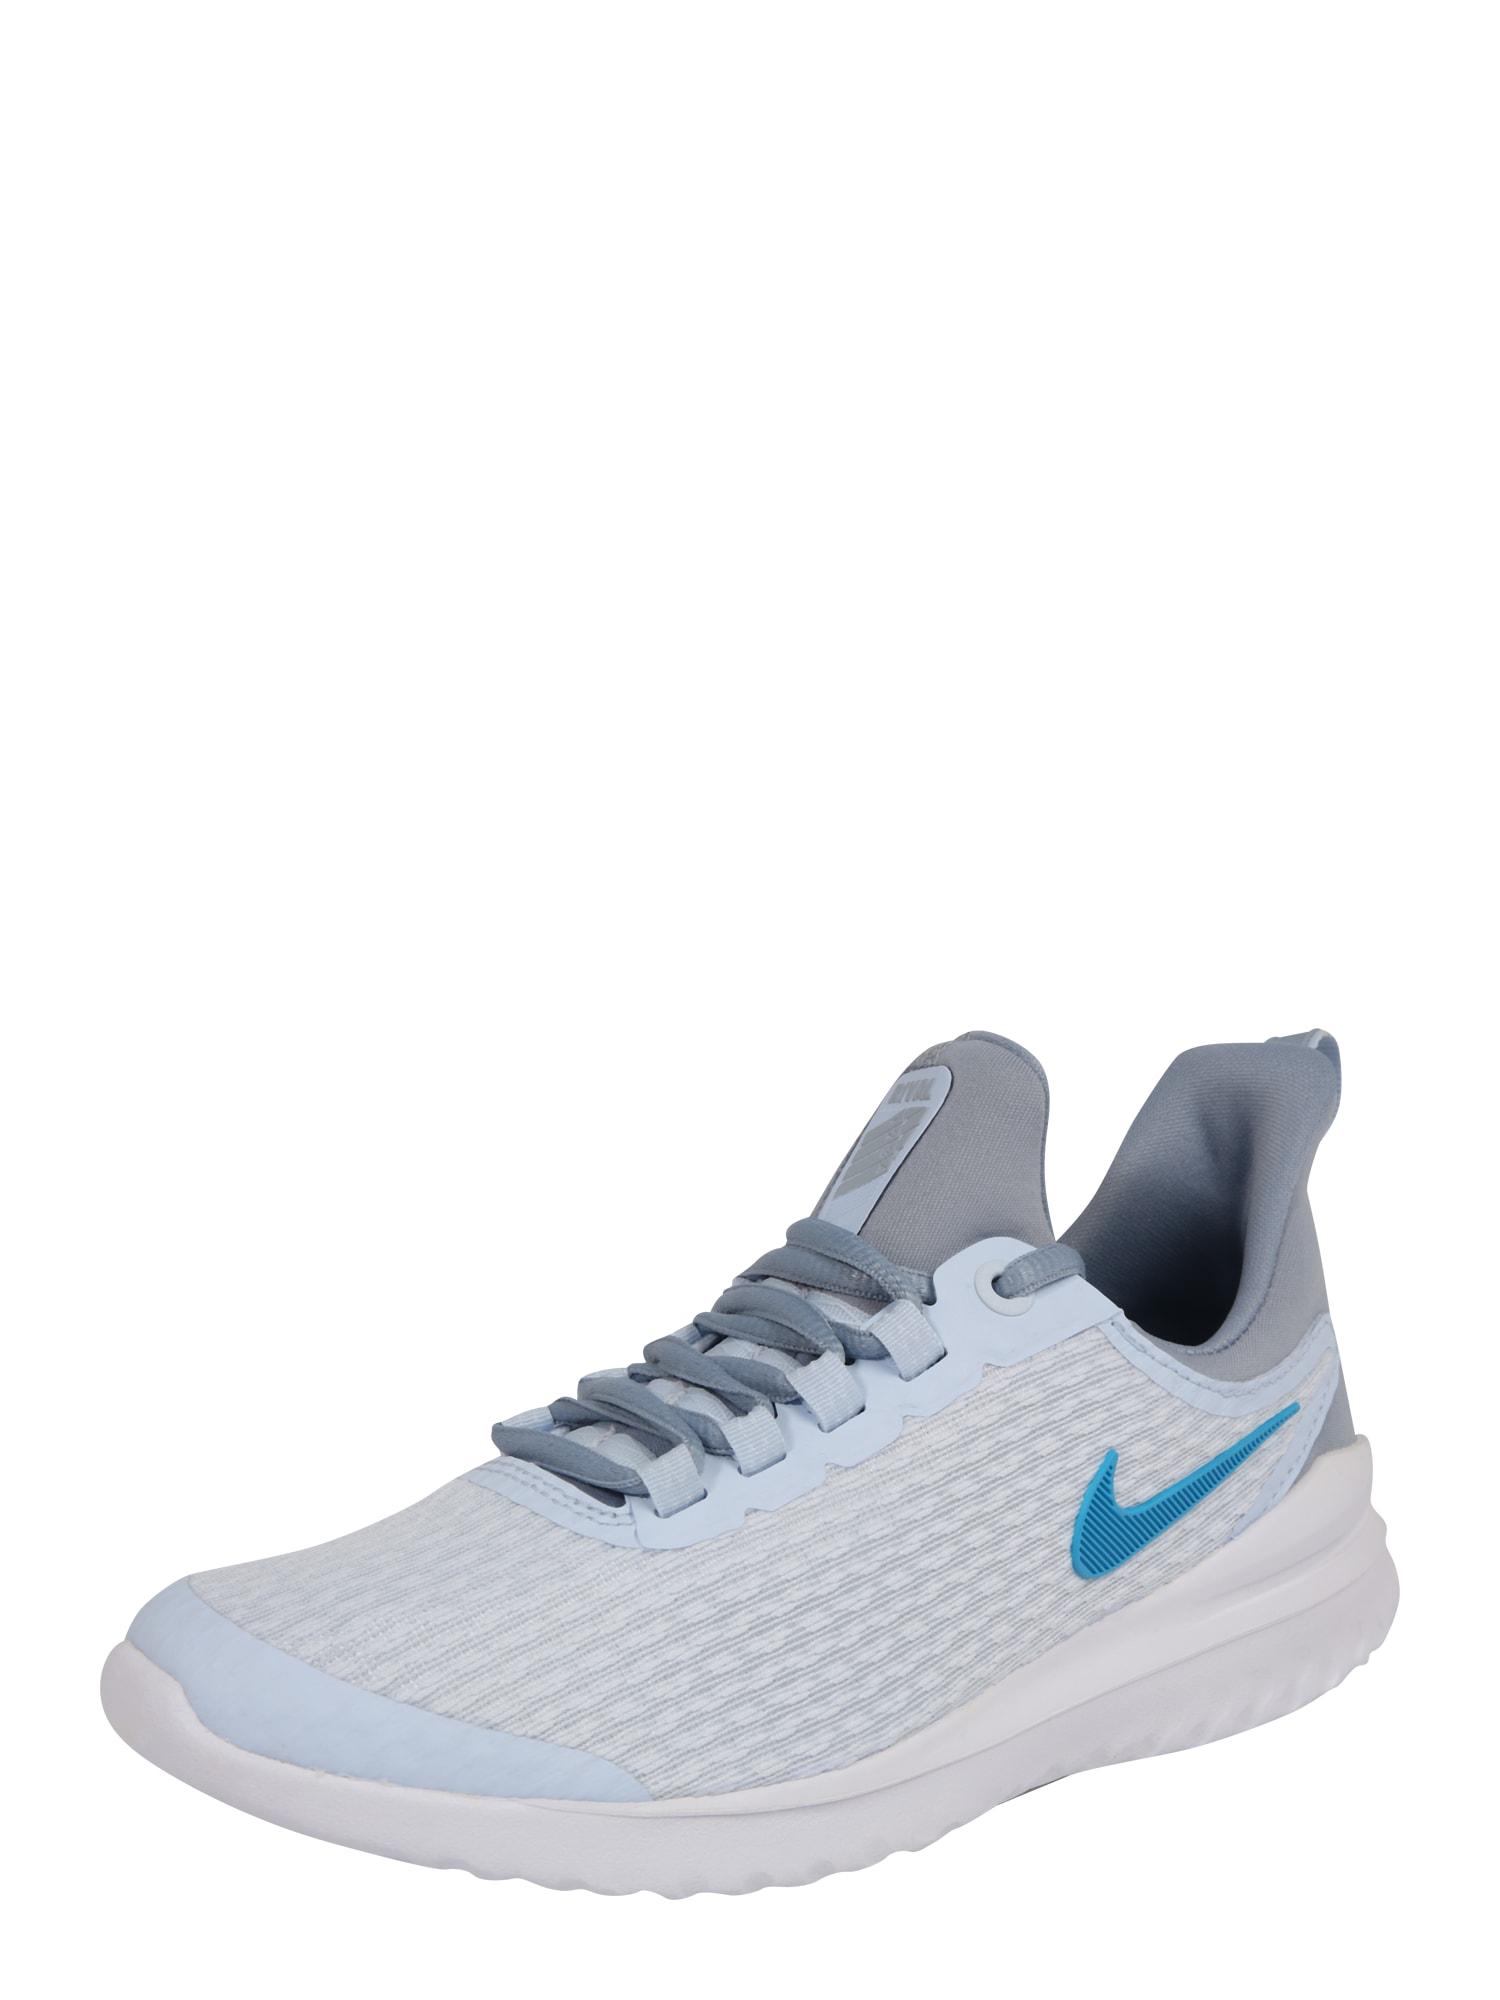 Sportovní boty Lunar Hayward modrá bílá NIKE